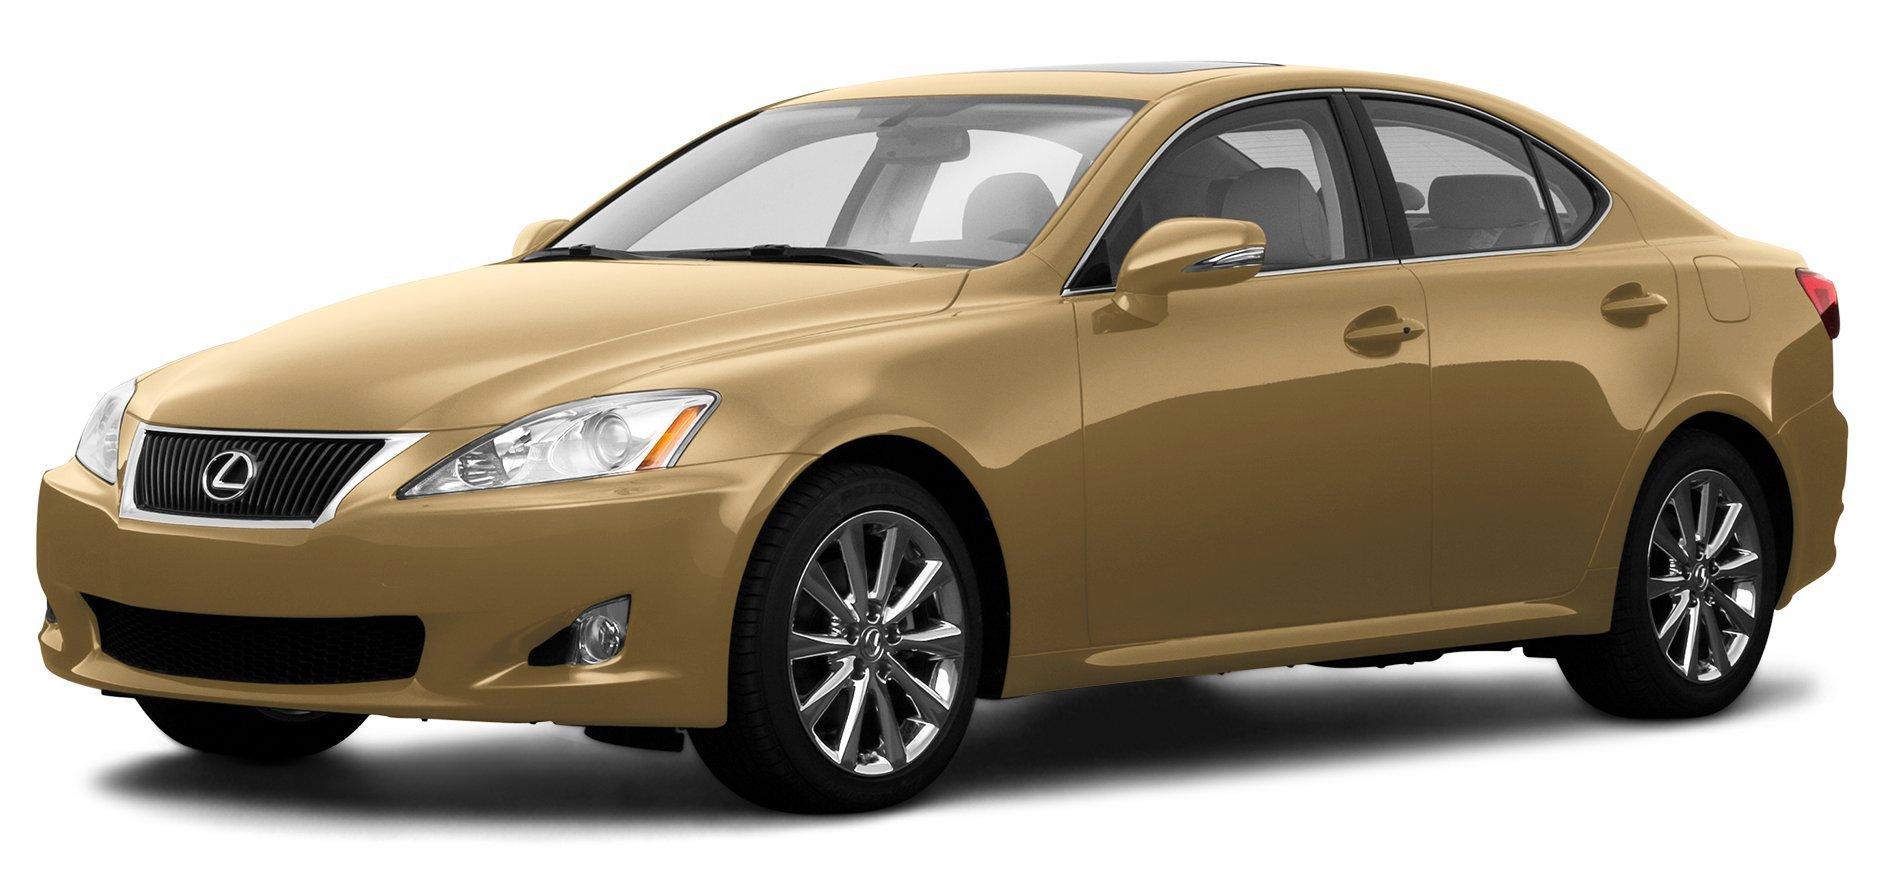 2009 Lexus IS250, 4 Door Sport Sedan Automatic Transmission All Wheel Drive  ...